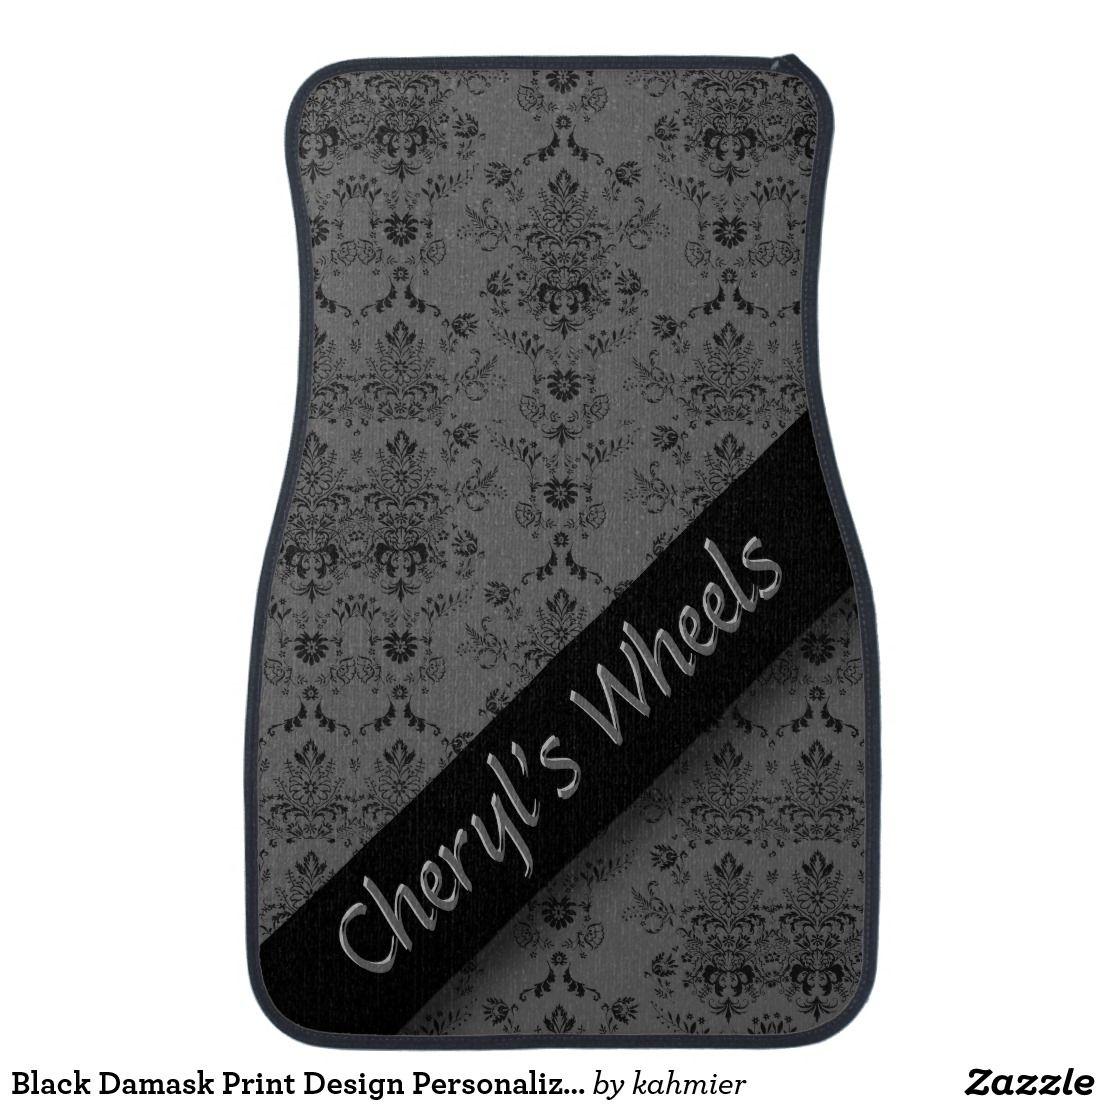 Black Damask Print Design Personalized Car Floor Mat